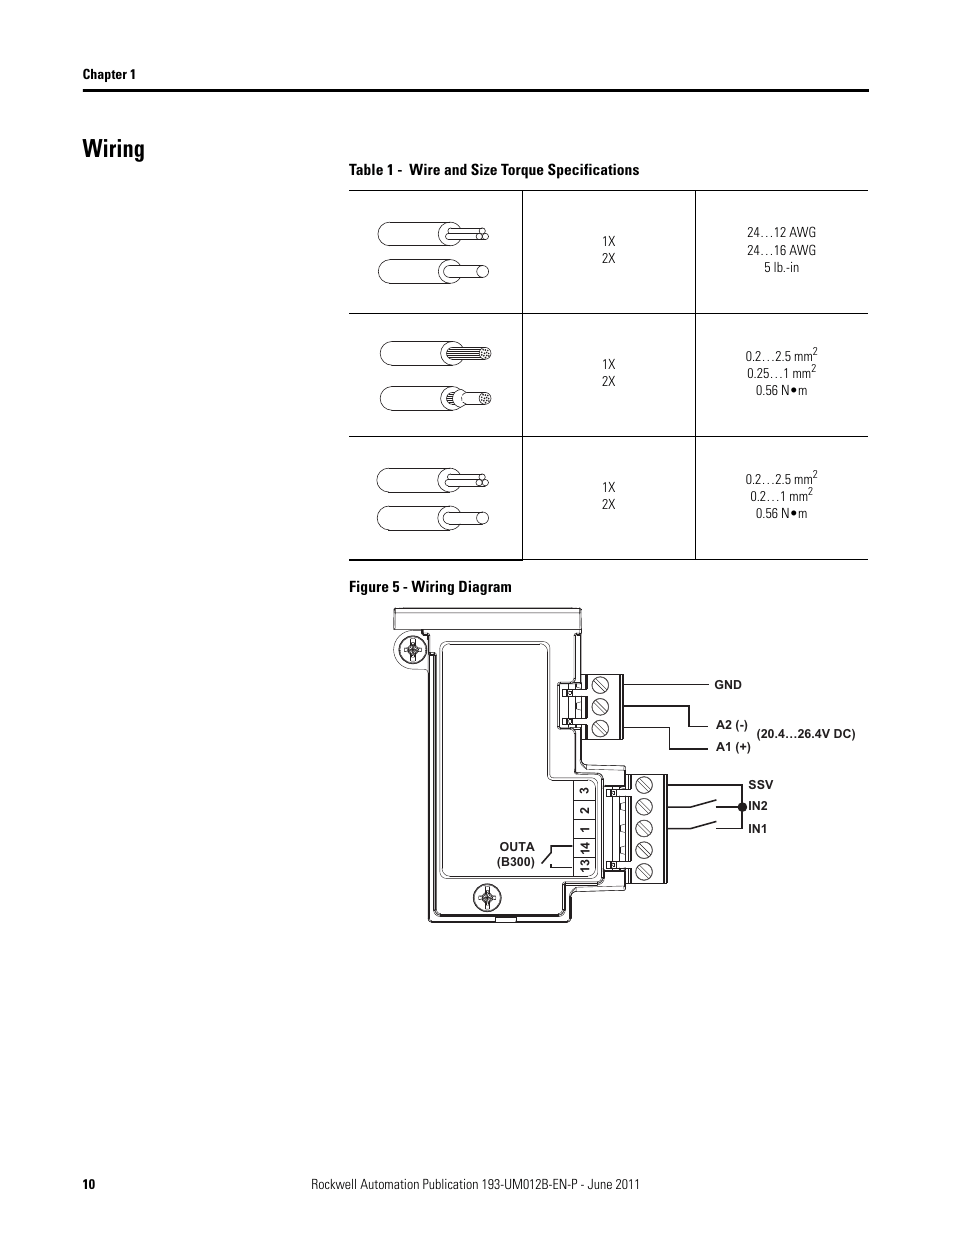 hight resolution of e1 wiring diagram wiring diagrame1 wiring diagram